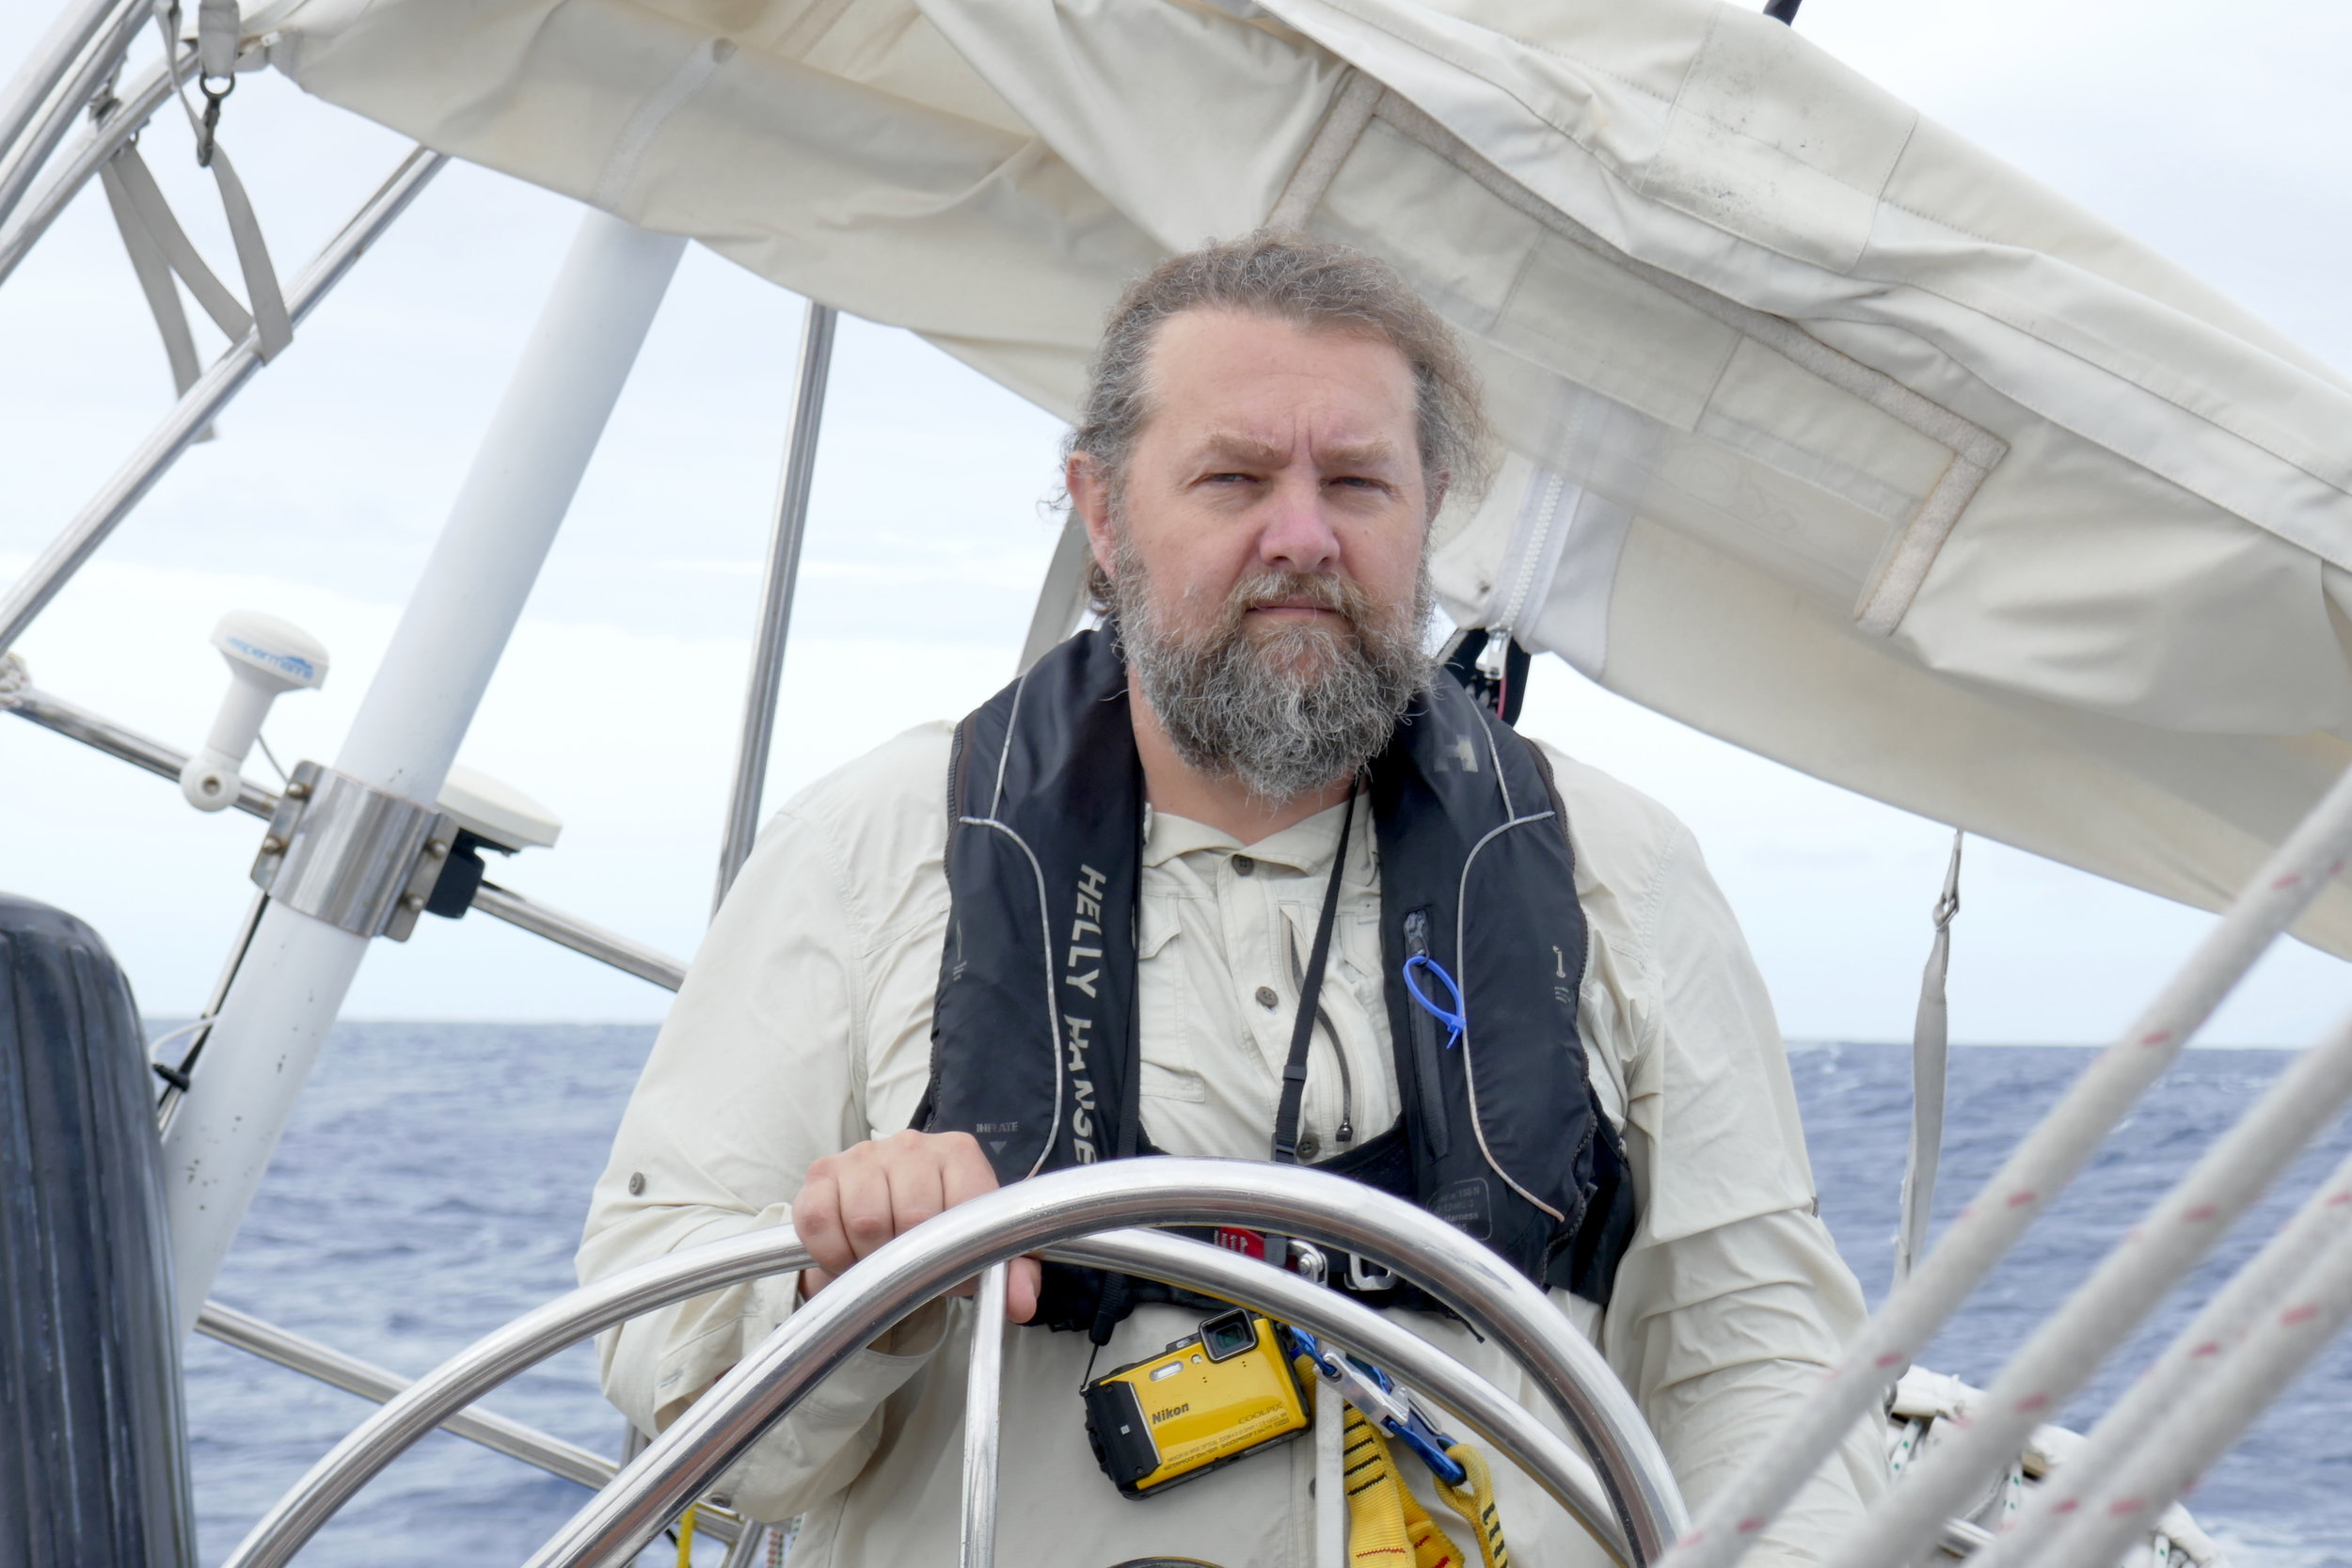 Vlado driving Isbjorn hard to windward en route to Antigua on Leg 1 of 2017.